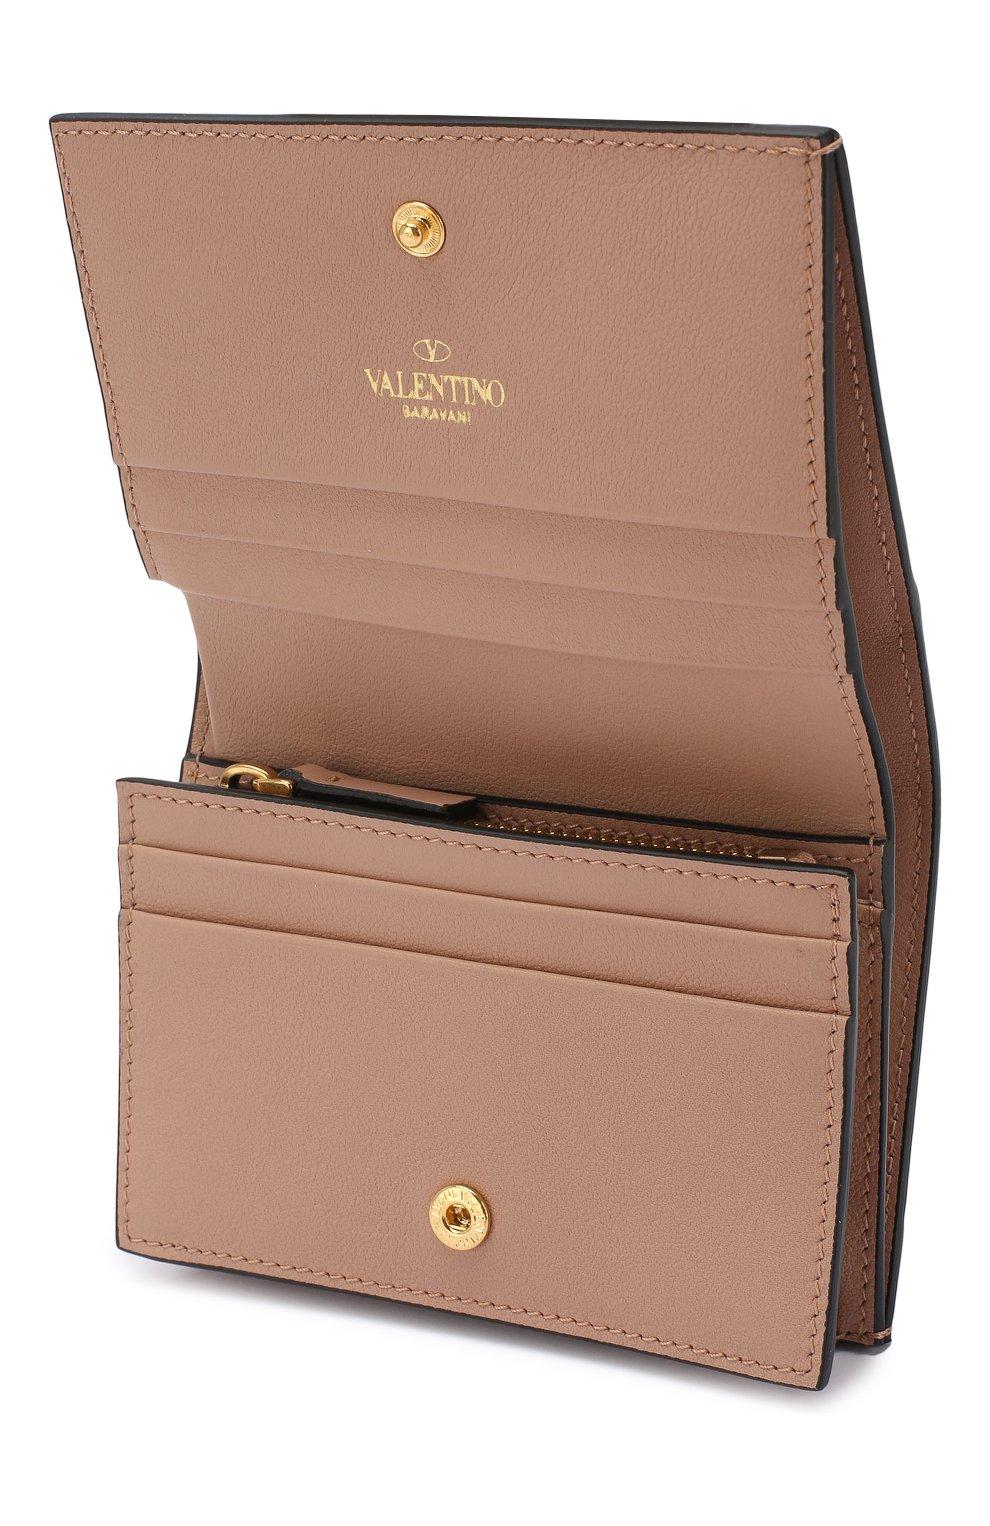 Кожаное портмоне Valentino Garavani Valentino бежевого цвета | Фото №3